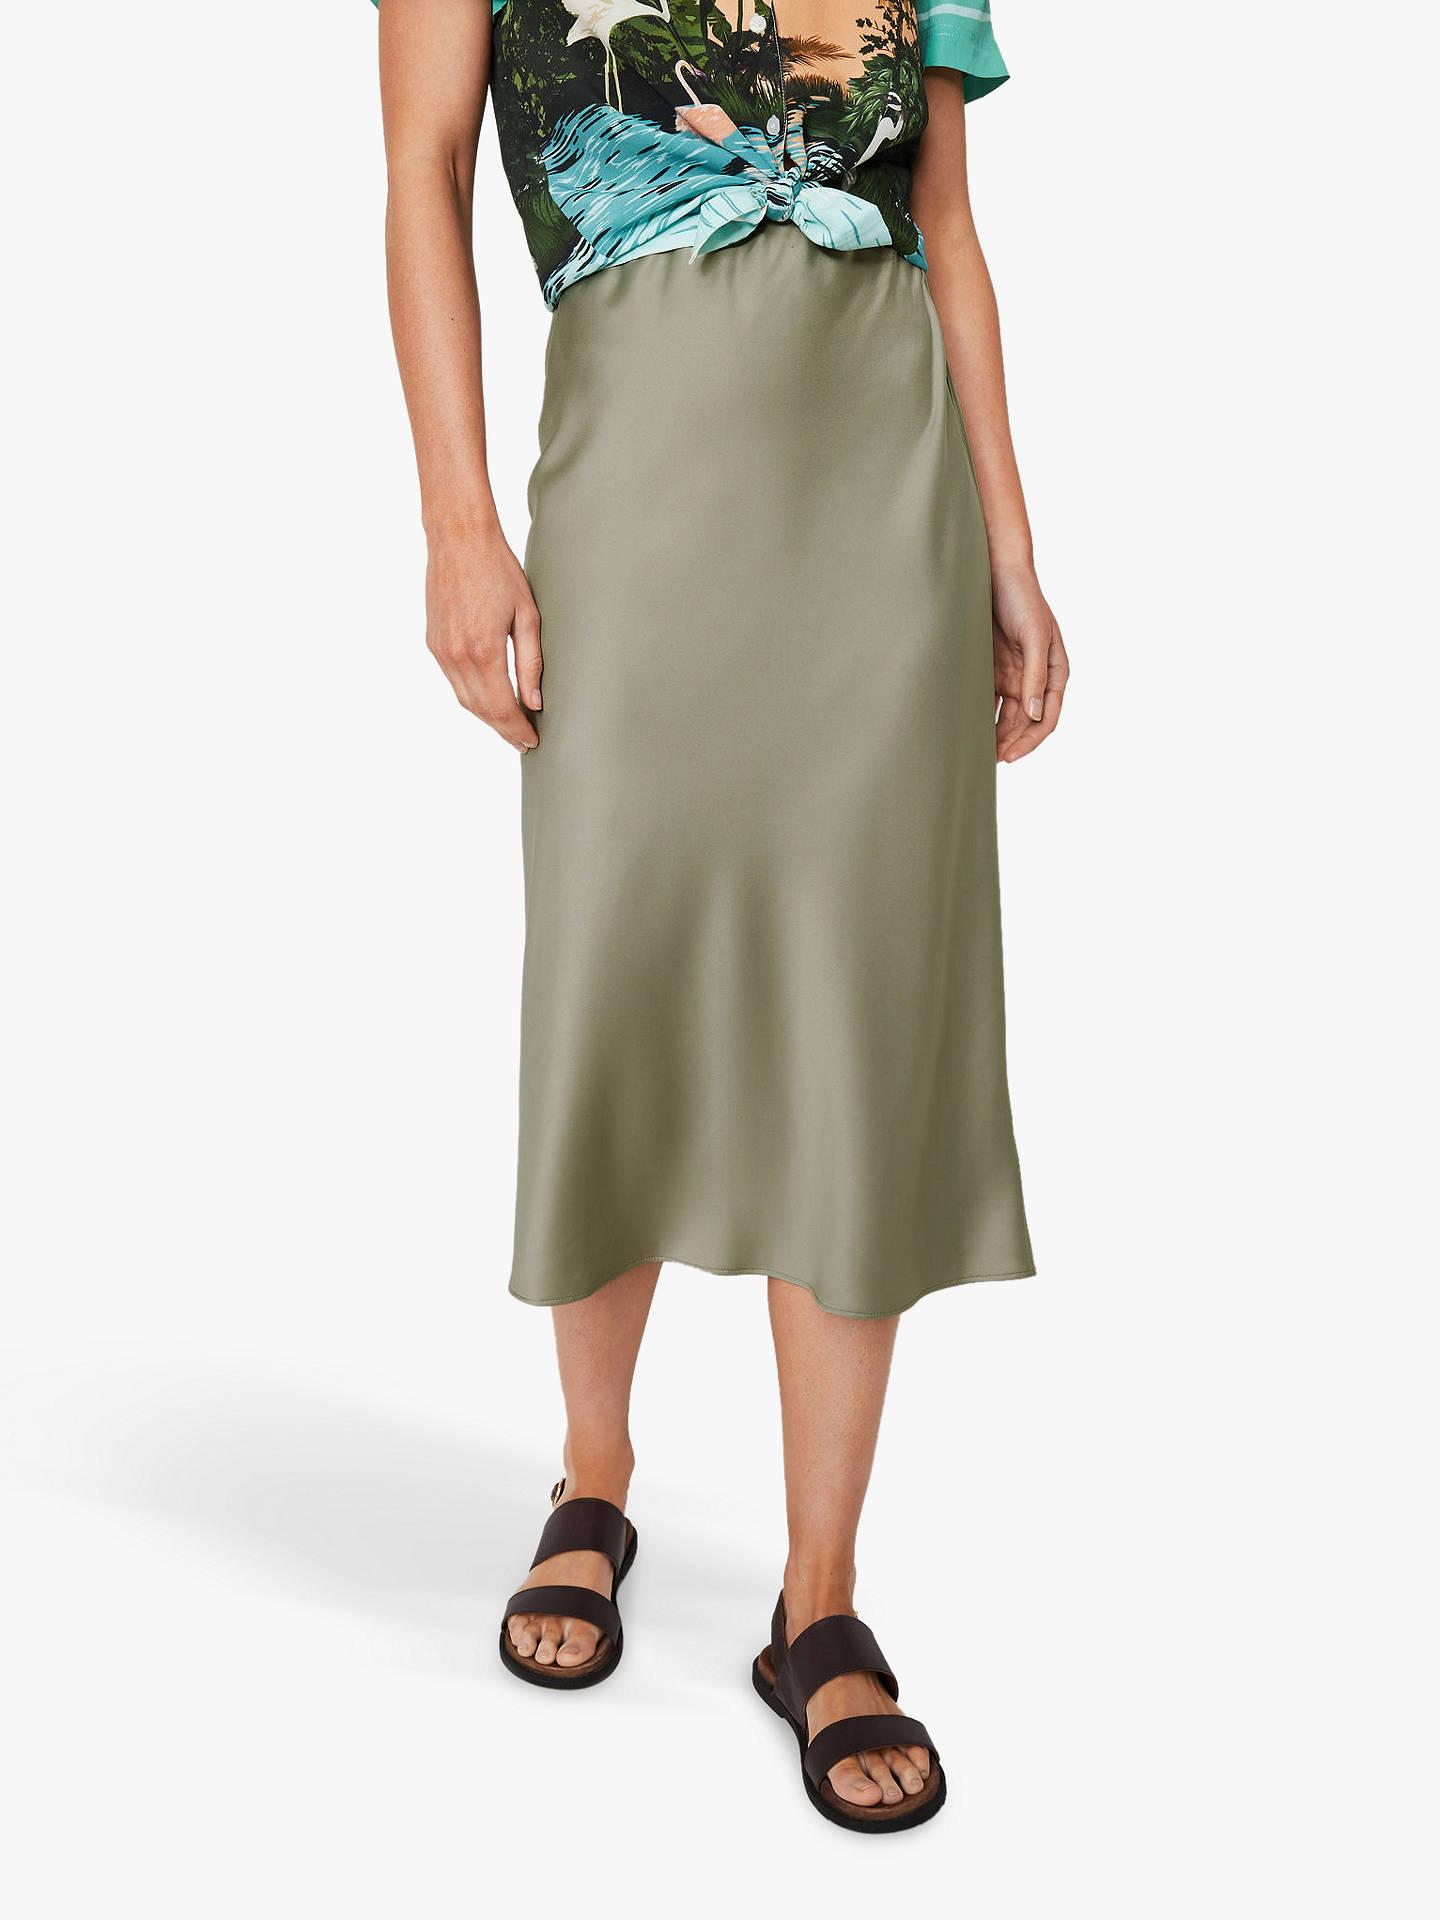 a292fcd123 Buy Warehouse Bias Cut Satin Skirt, Khaki, 6 Online at johnlewis.com ...